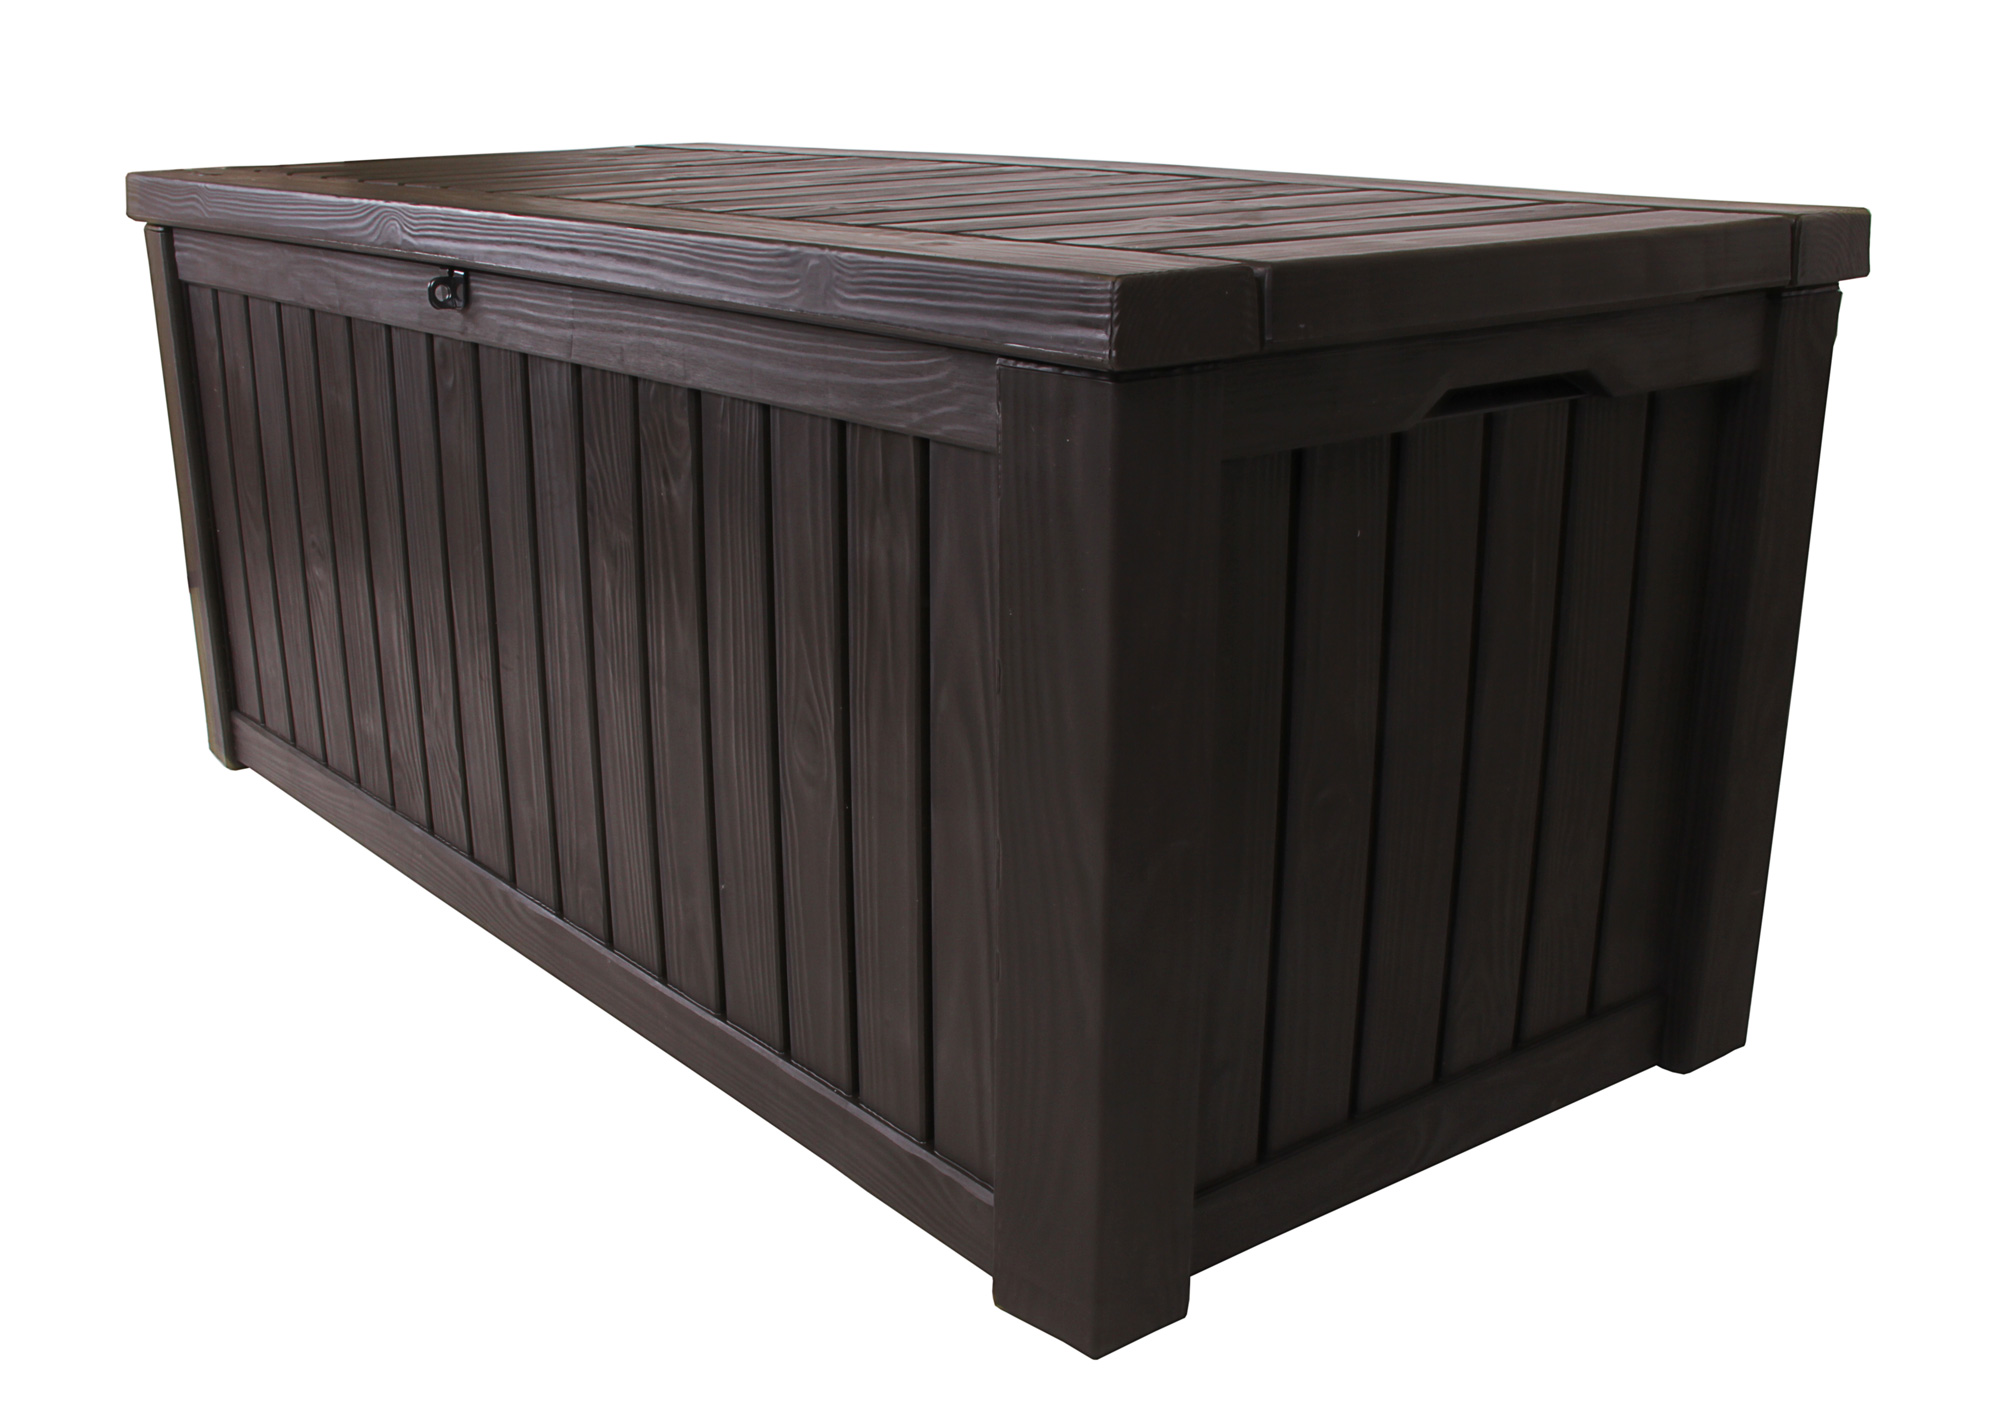 kissenbox auflagenbox keter sitzbank wasserdicht bel ftet bank neu pictures to pin on pinterest. Black Bedroom Furniture Sets. Home Design Ideas